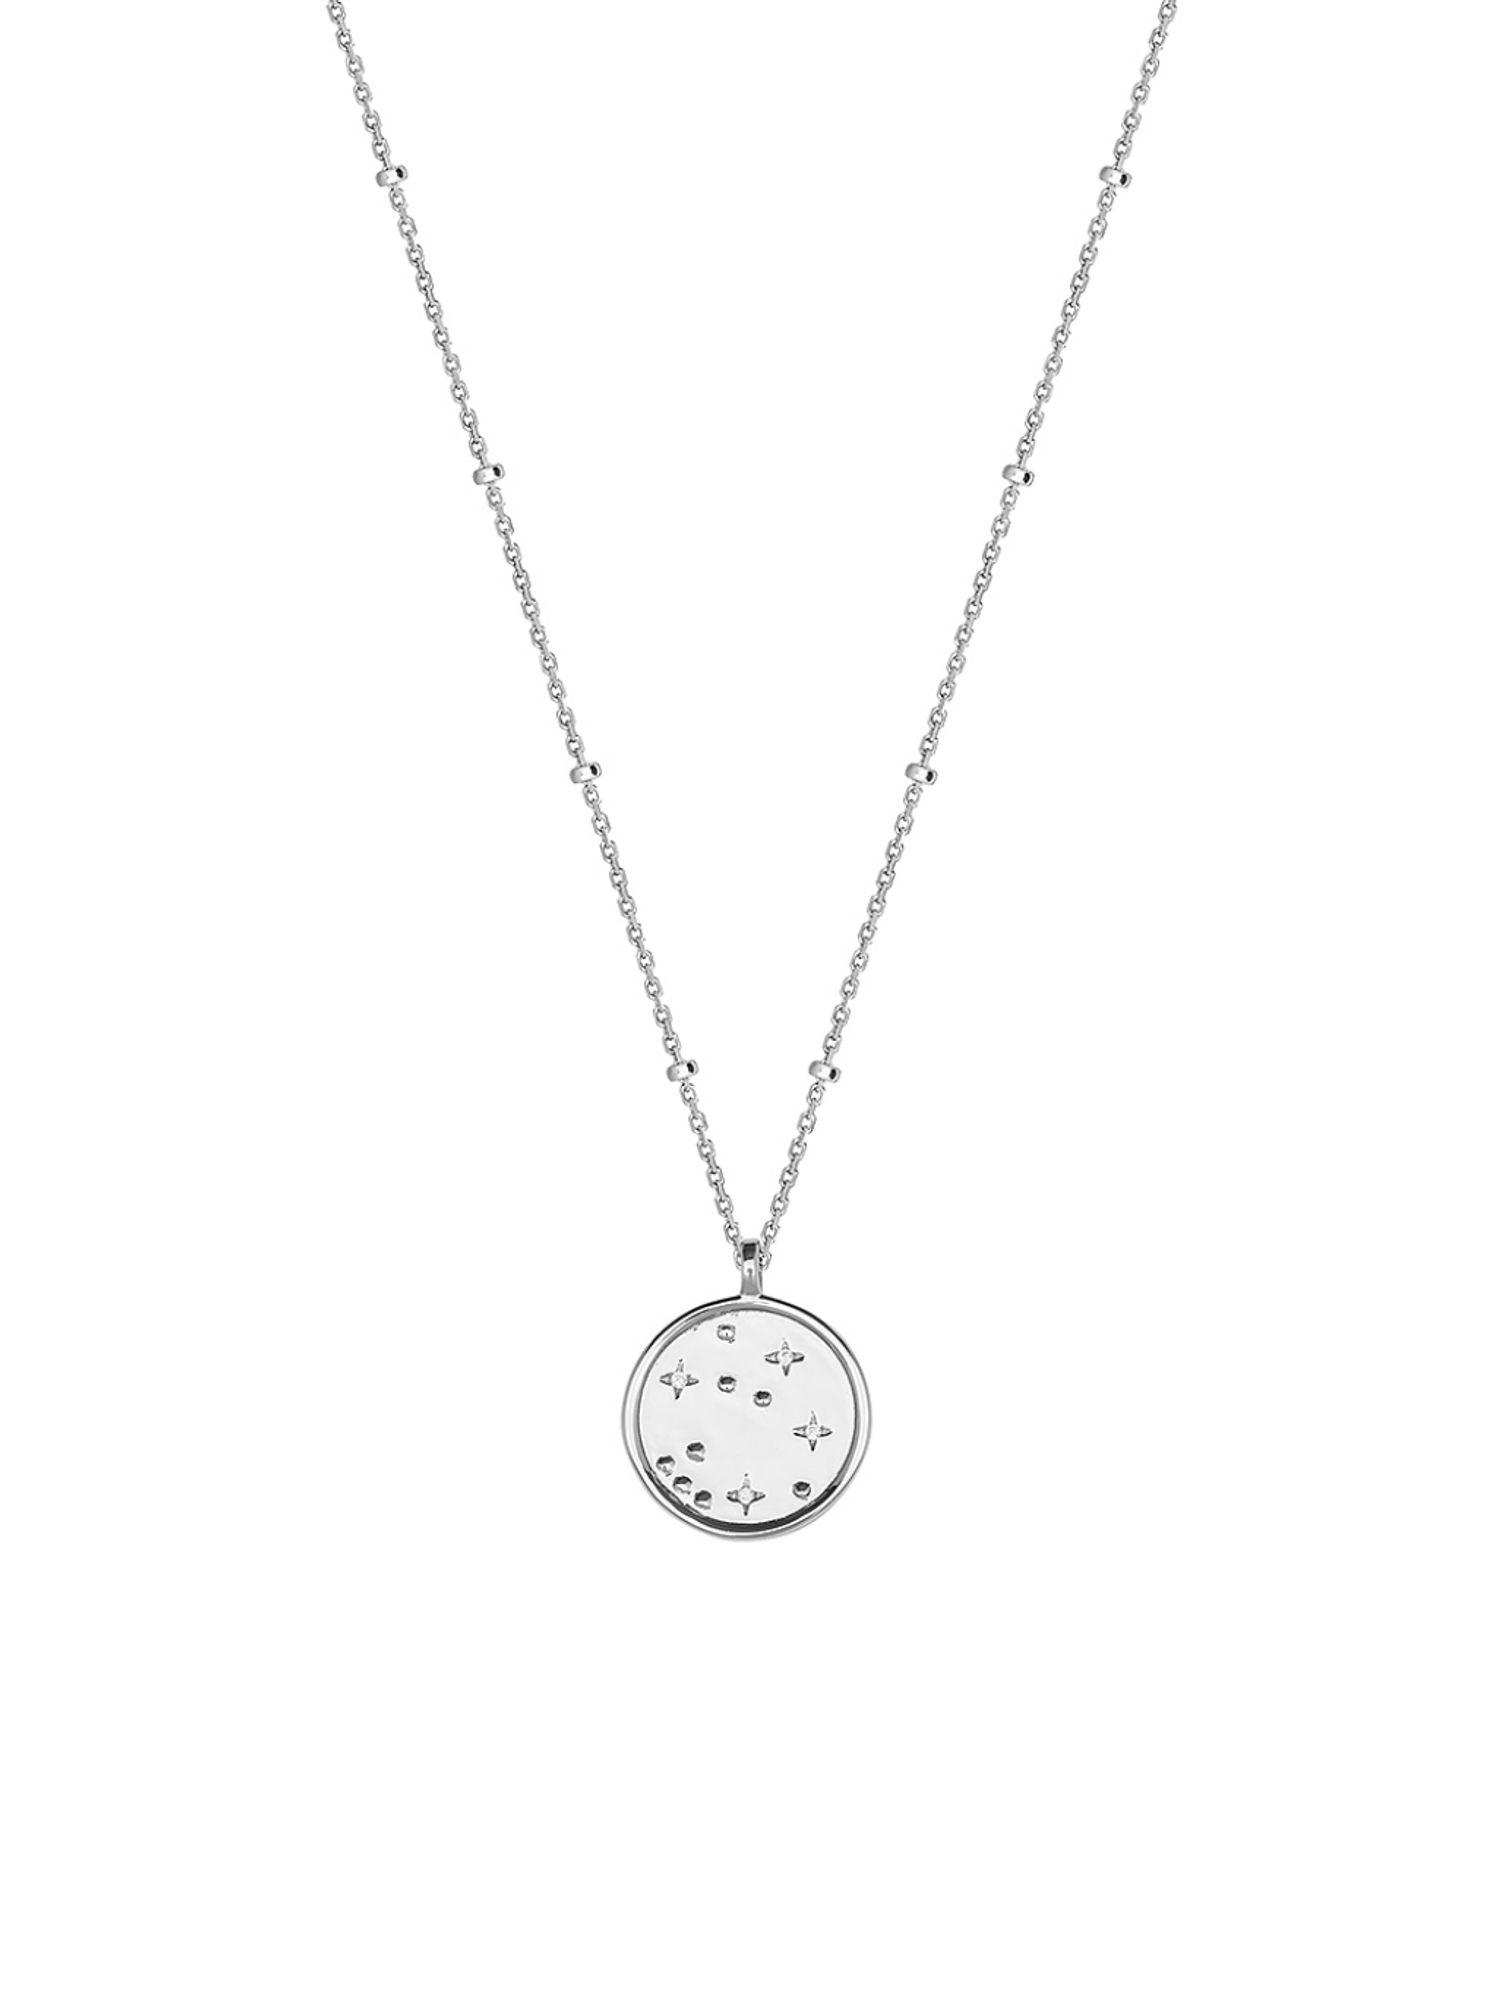 XENOX XS1526 Damen Collier Moonwalk Sterling-Silber 925 Silber 45 cm